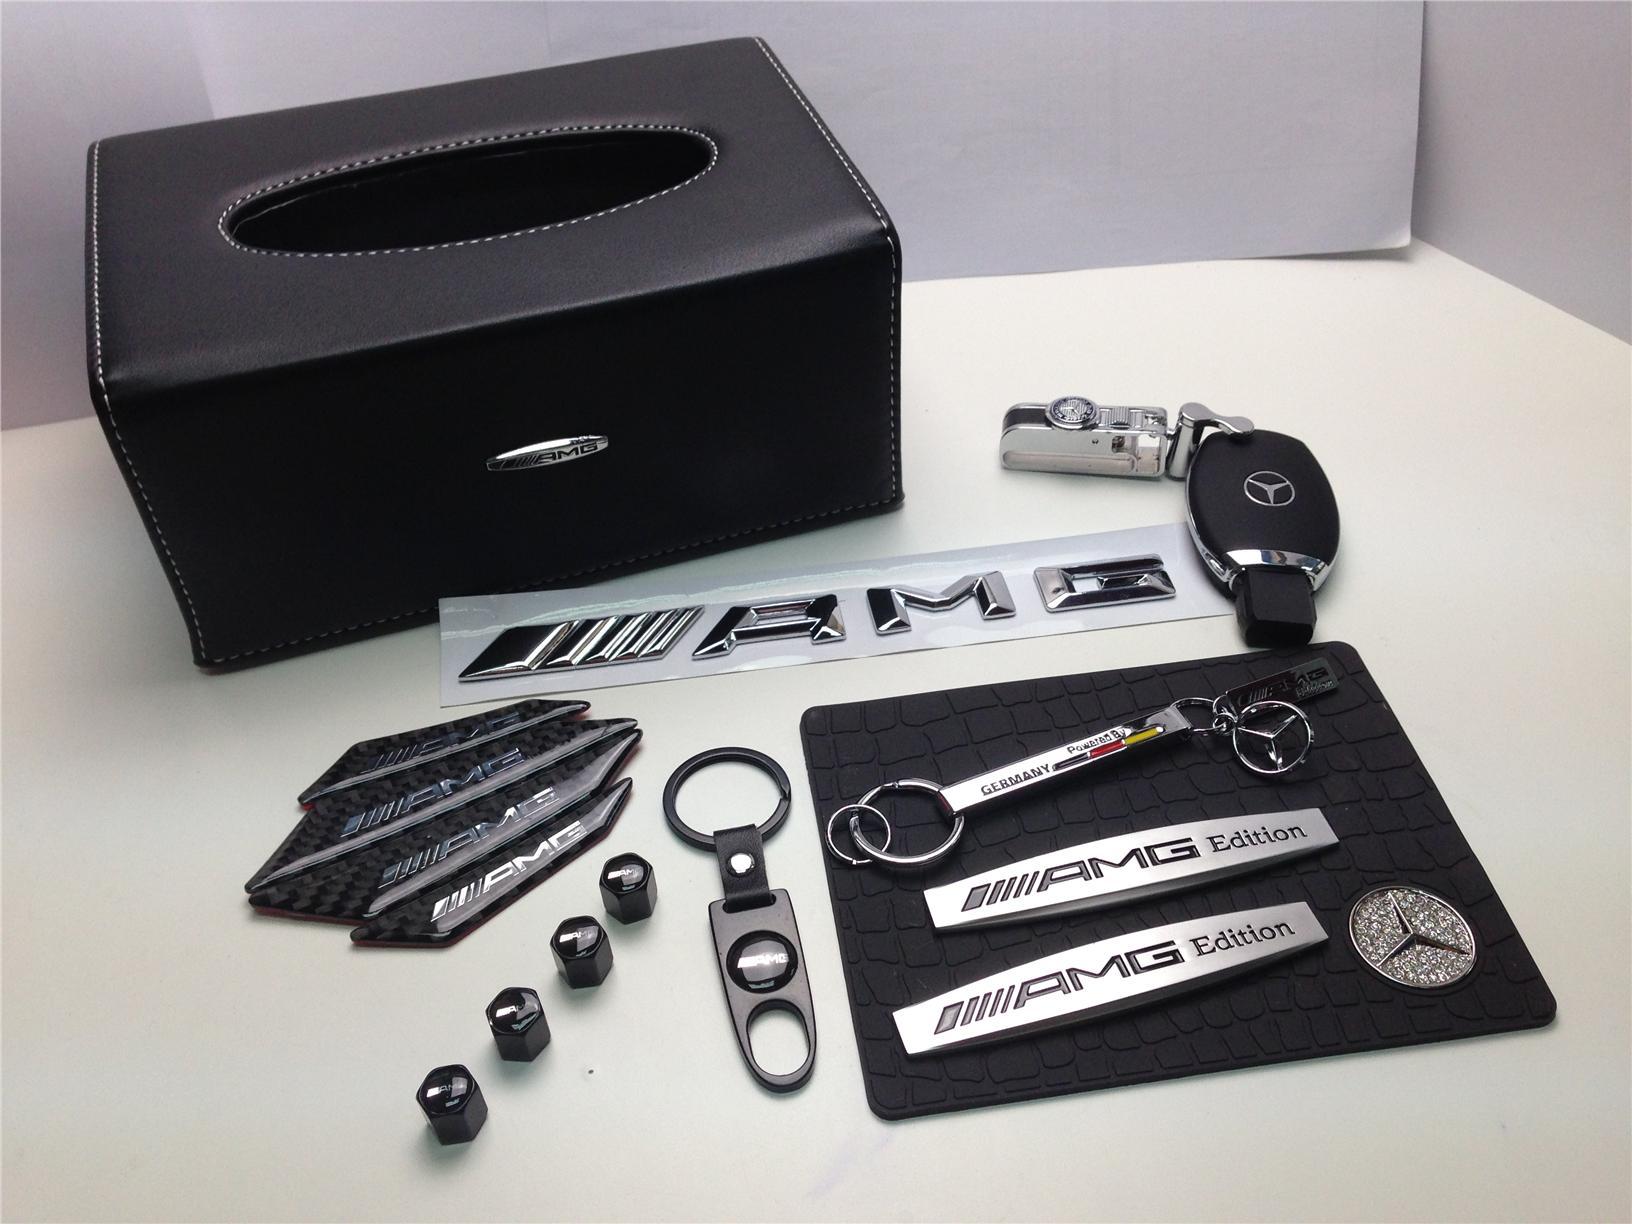 Mercedes amg premium accessories set end 5 11 2016 3 15 pm for Mercedes benz e350 parts accessories